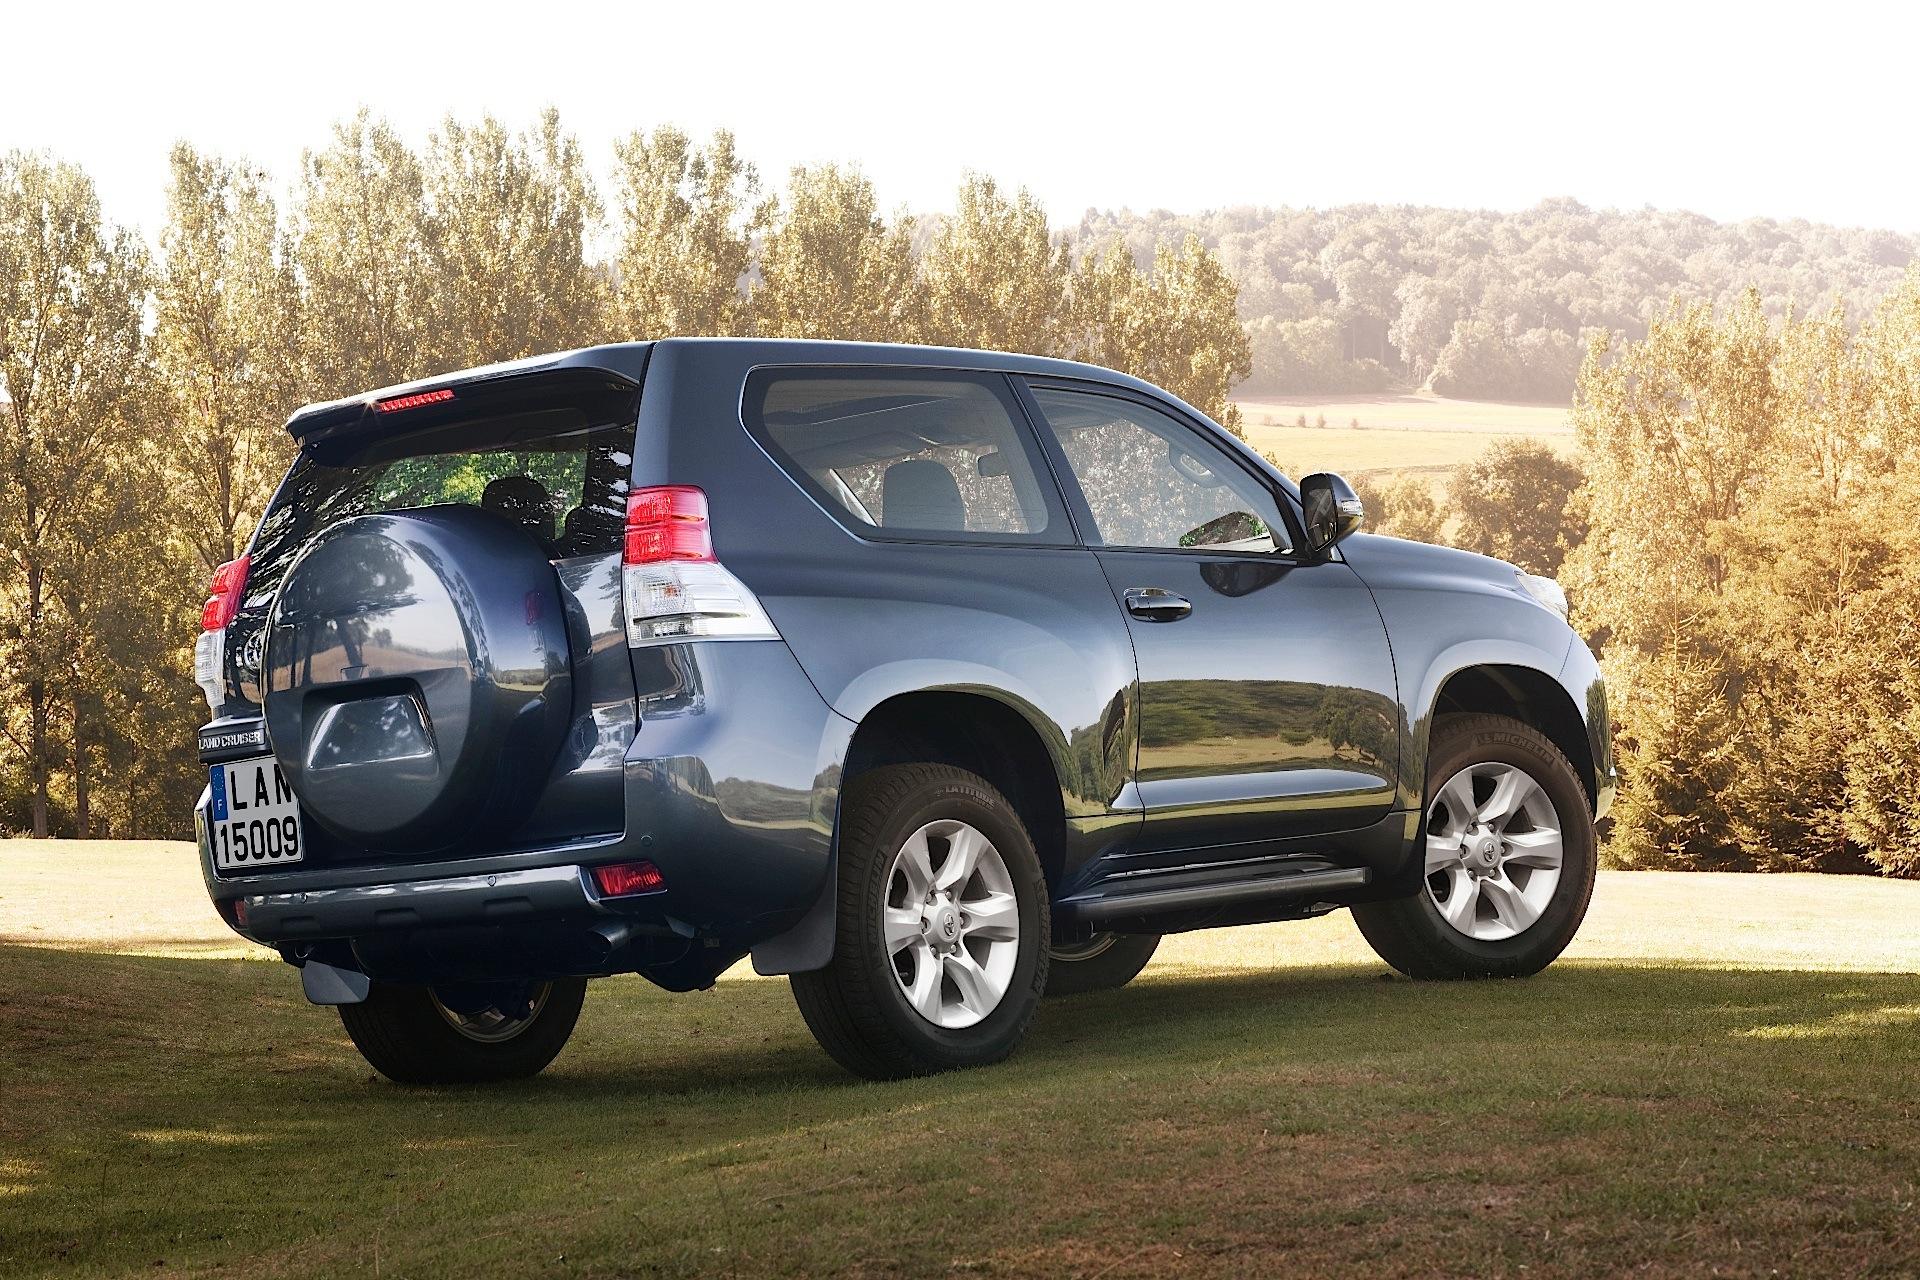 Toyota Land Cruiser Diesel >> TOYOTA Land Cruiser 150 3 Doors specs - 2009, 2010, 2011, 2012, 2013 - autoevolution